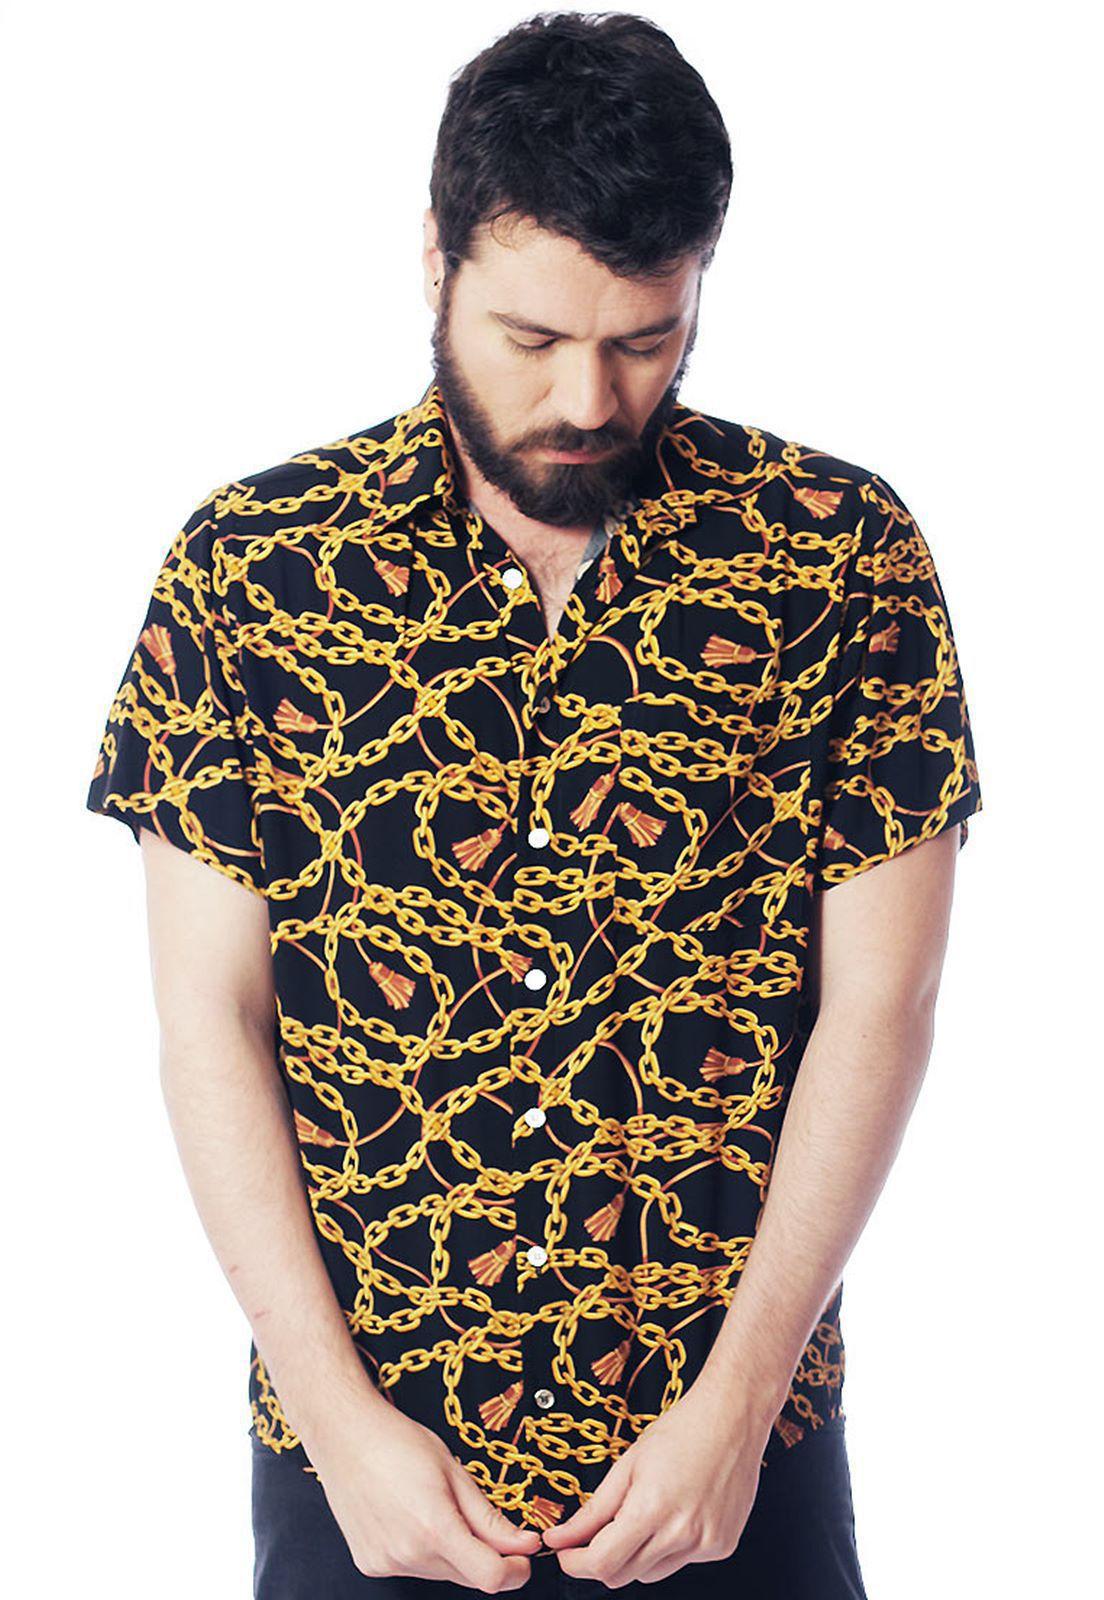 Camisa Estampada ElephunK Chains Preta